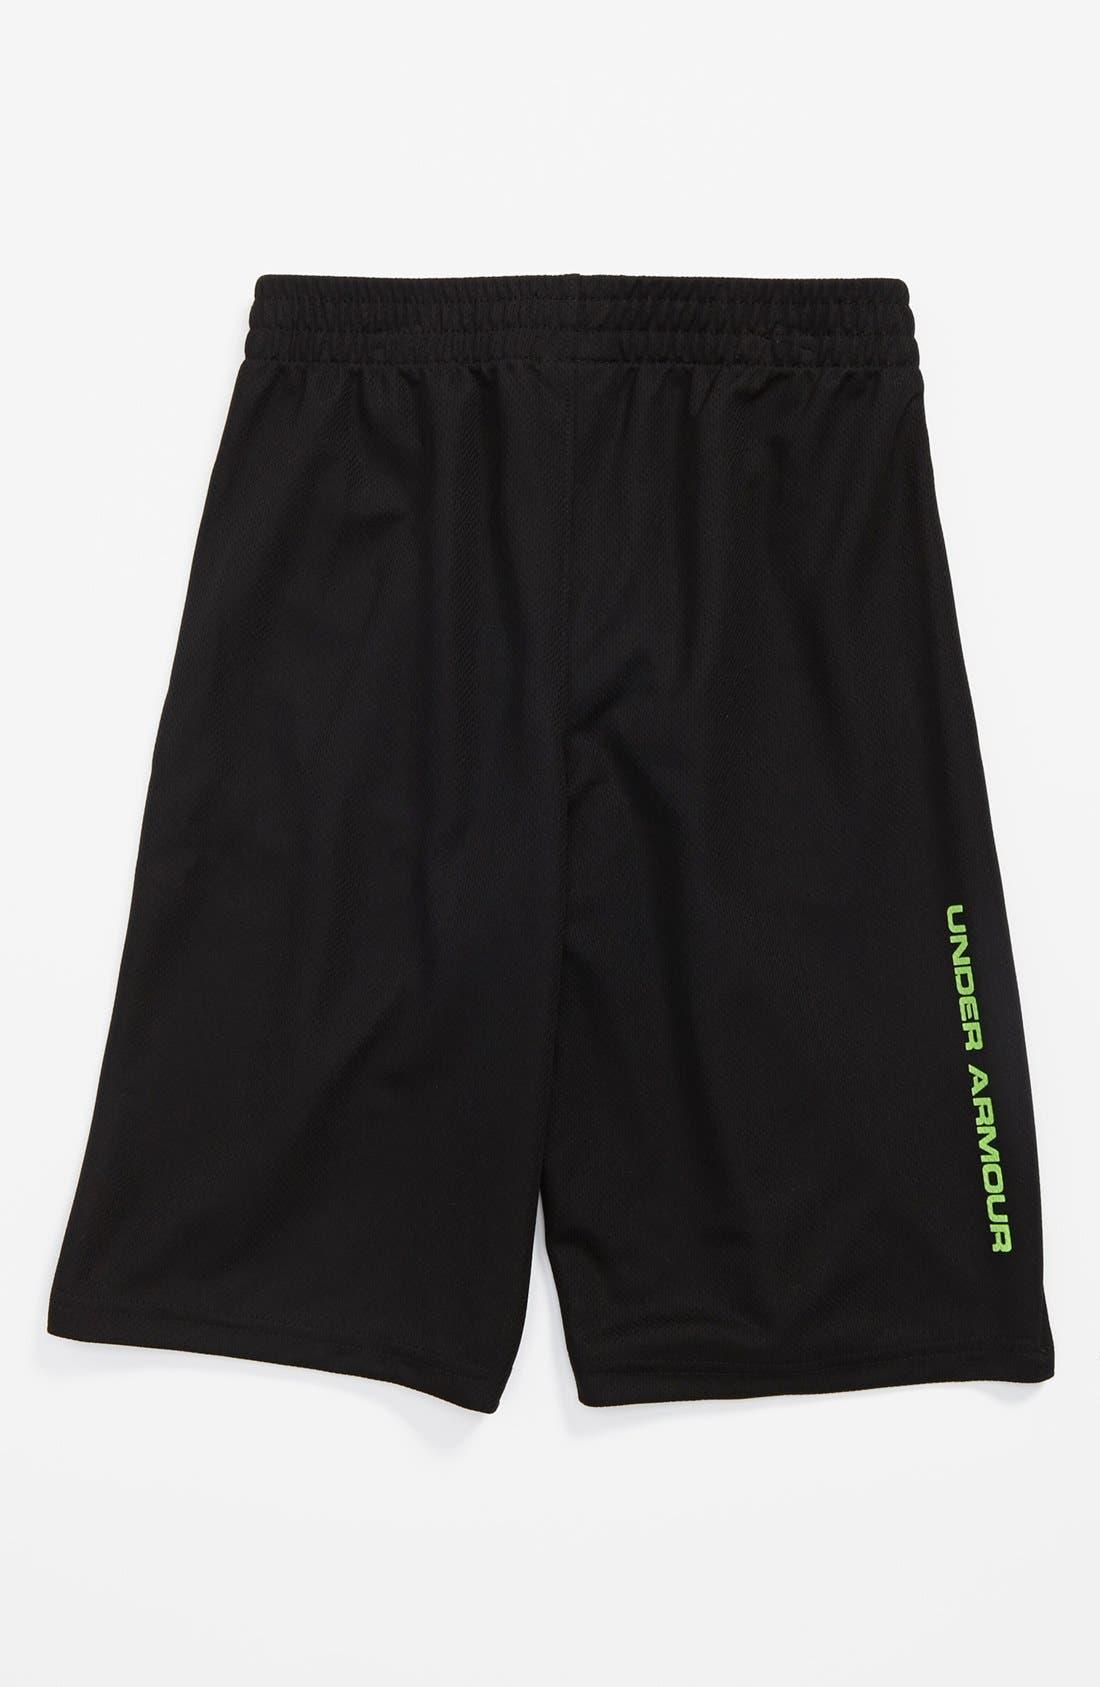 Alternate Image 2  - Under Armour 'Monster Mesh' HeatGear® Shorts (Little Boys)